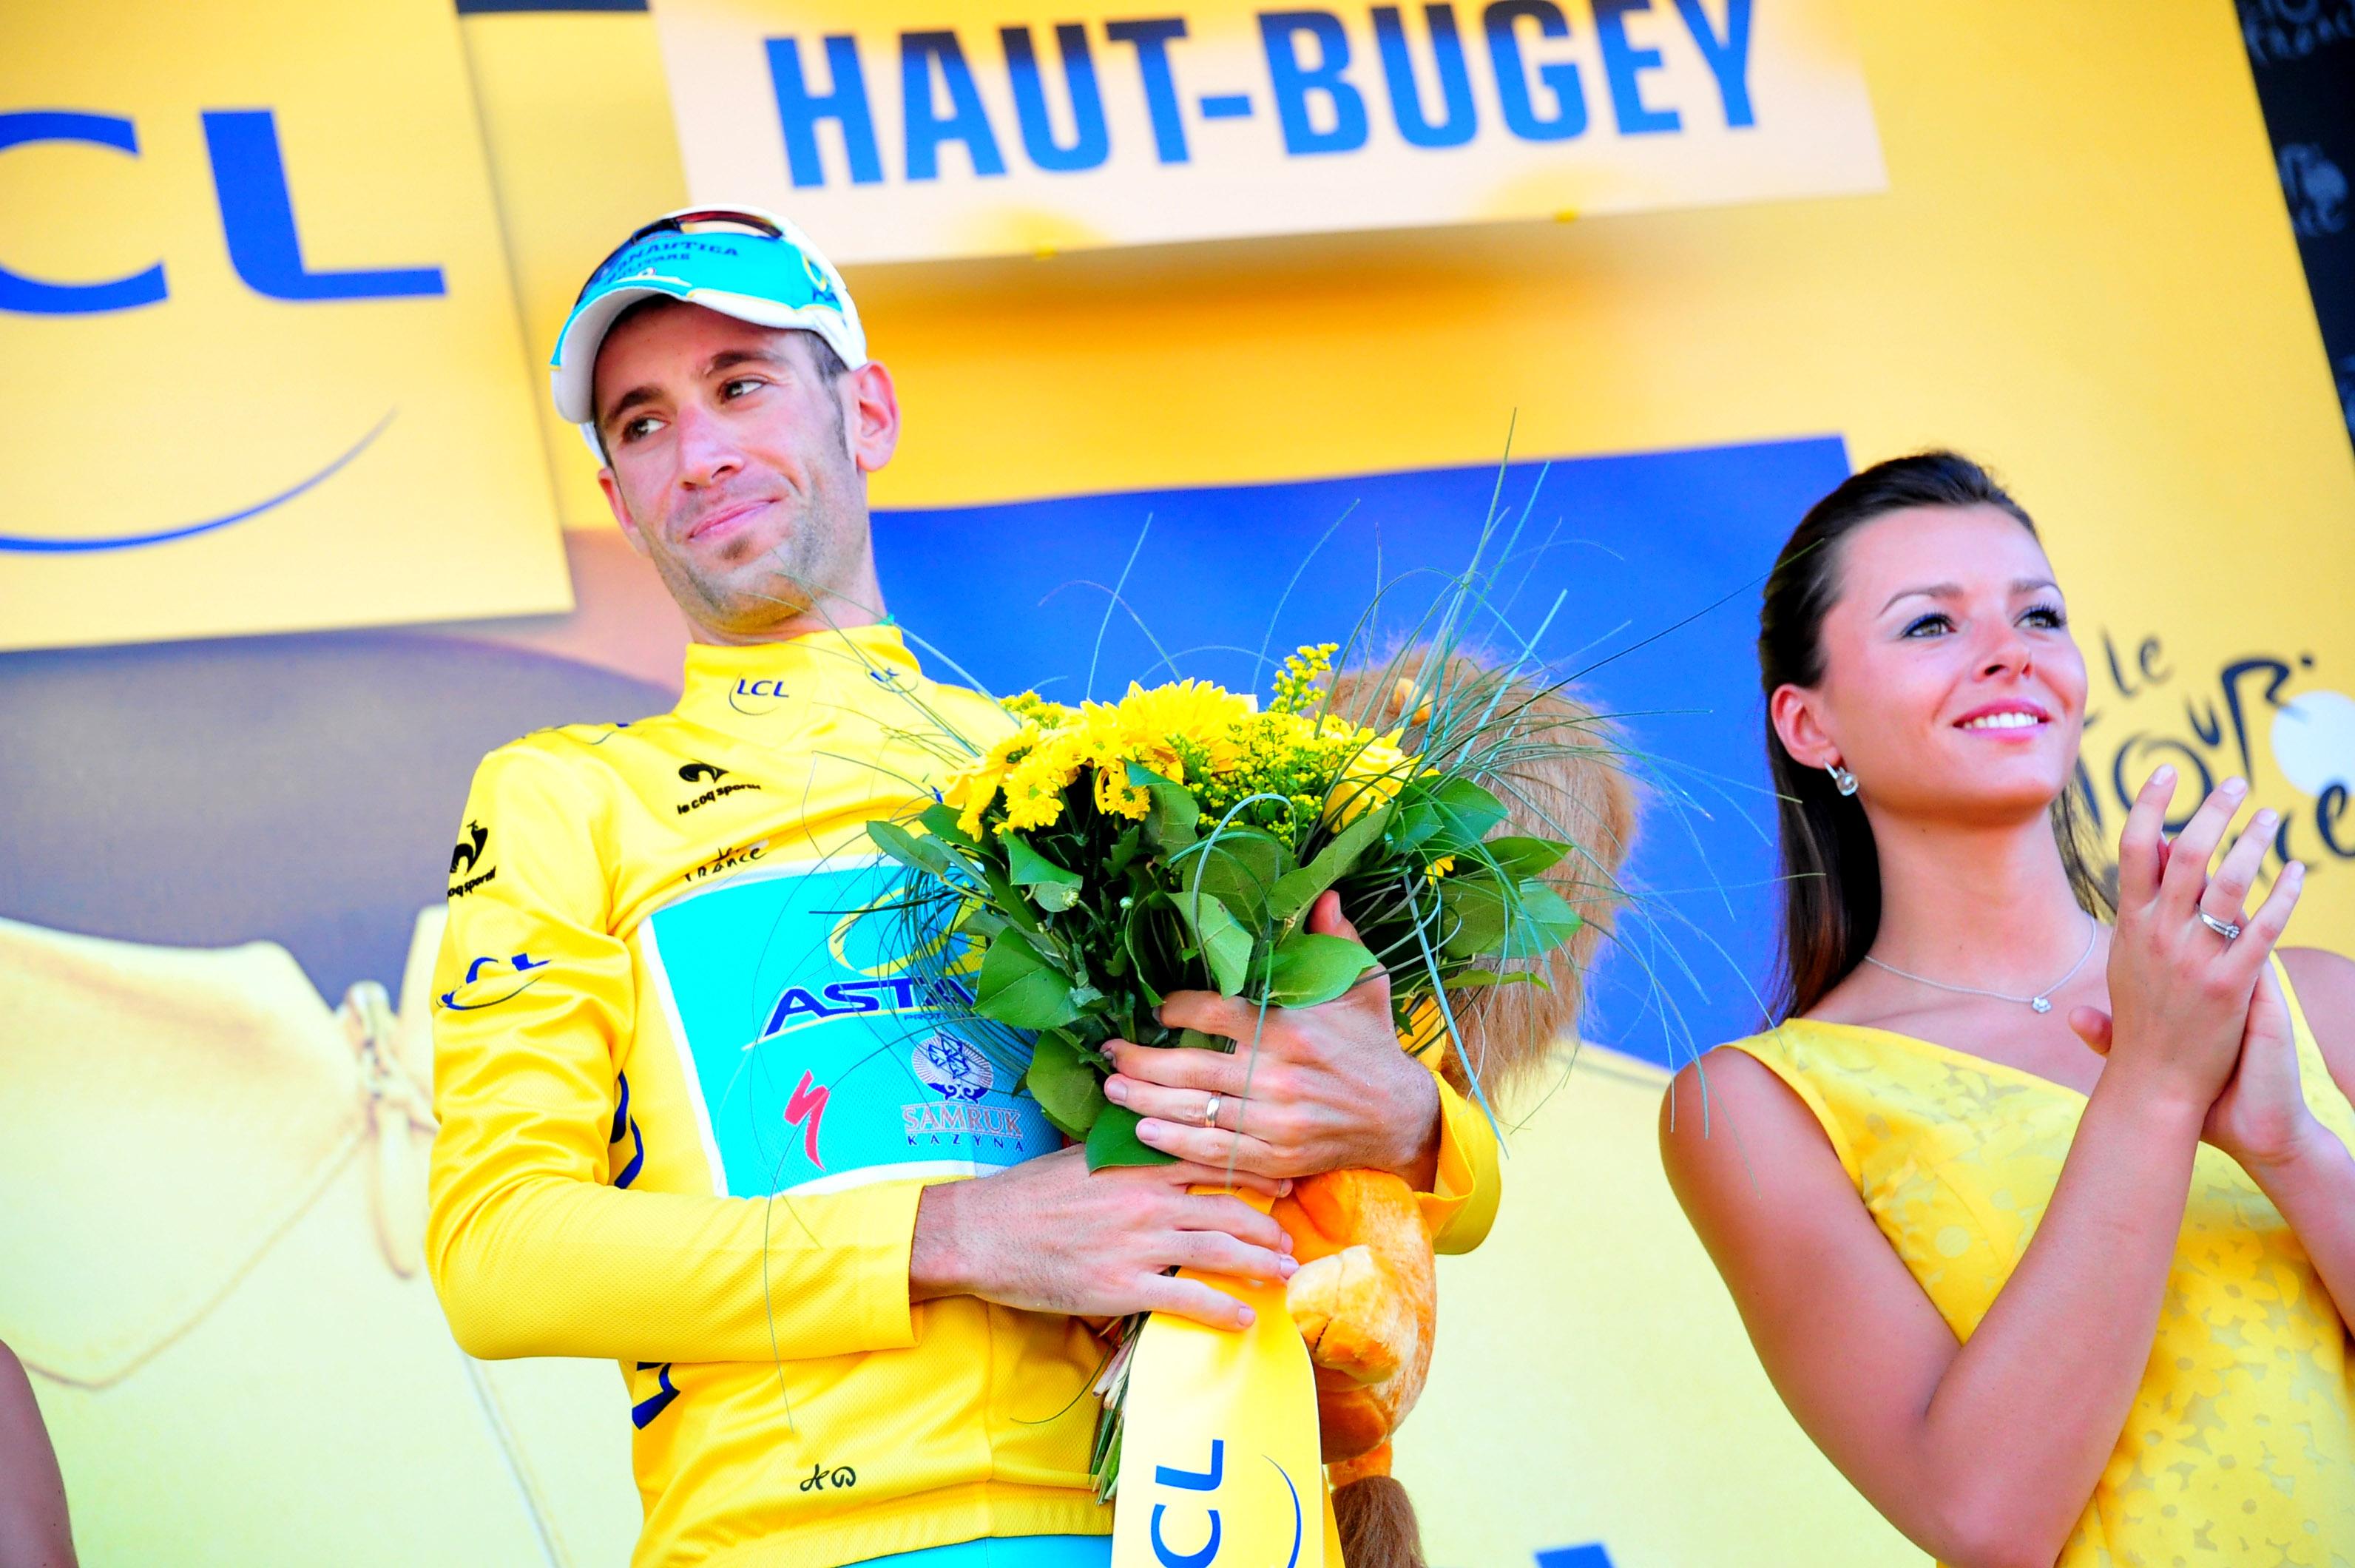 Tour de France 11. Etappe - Gallopin siegt - Nibali bleibt im Gelben Trikot (Foto: Sirotti)